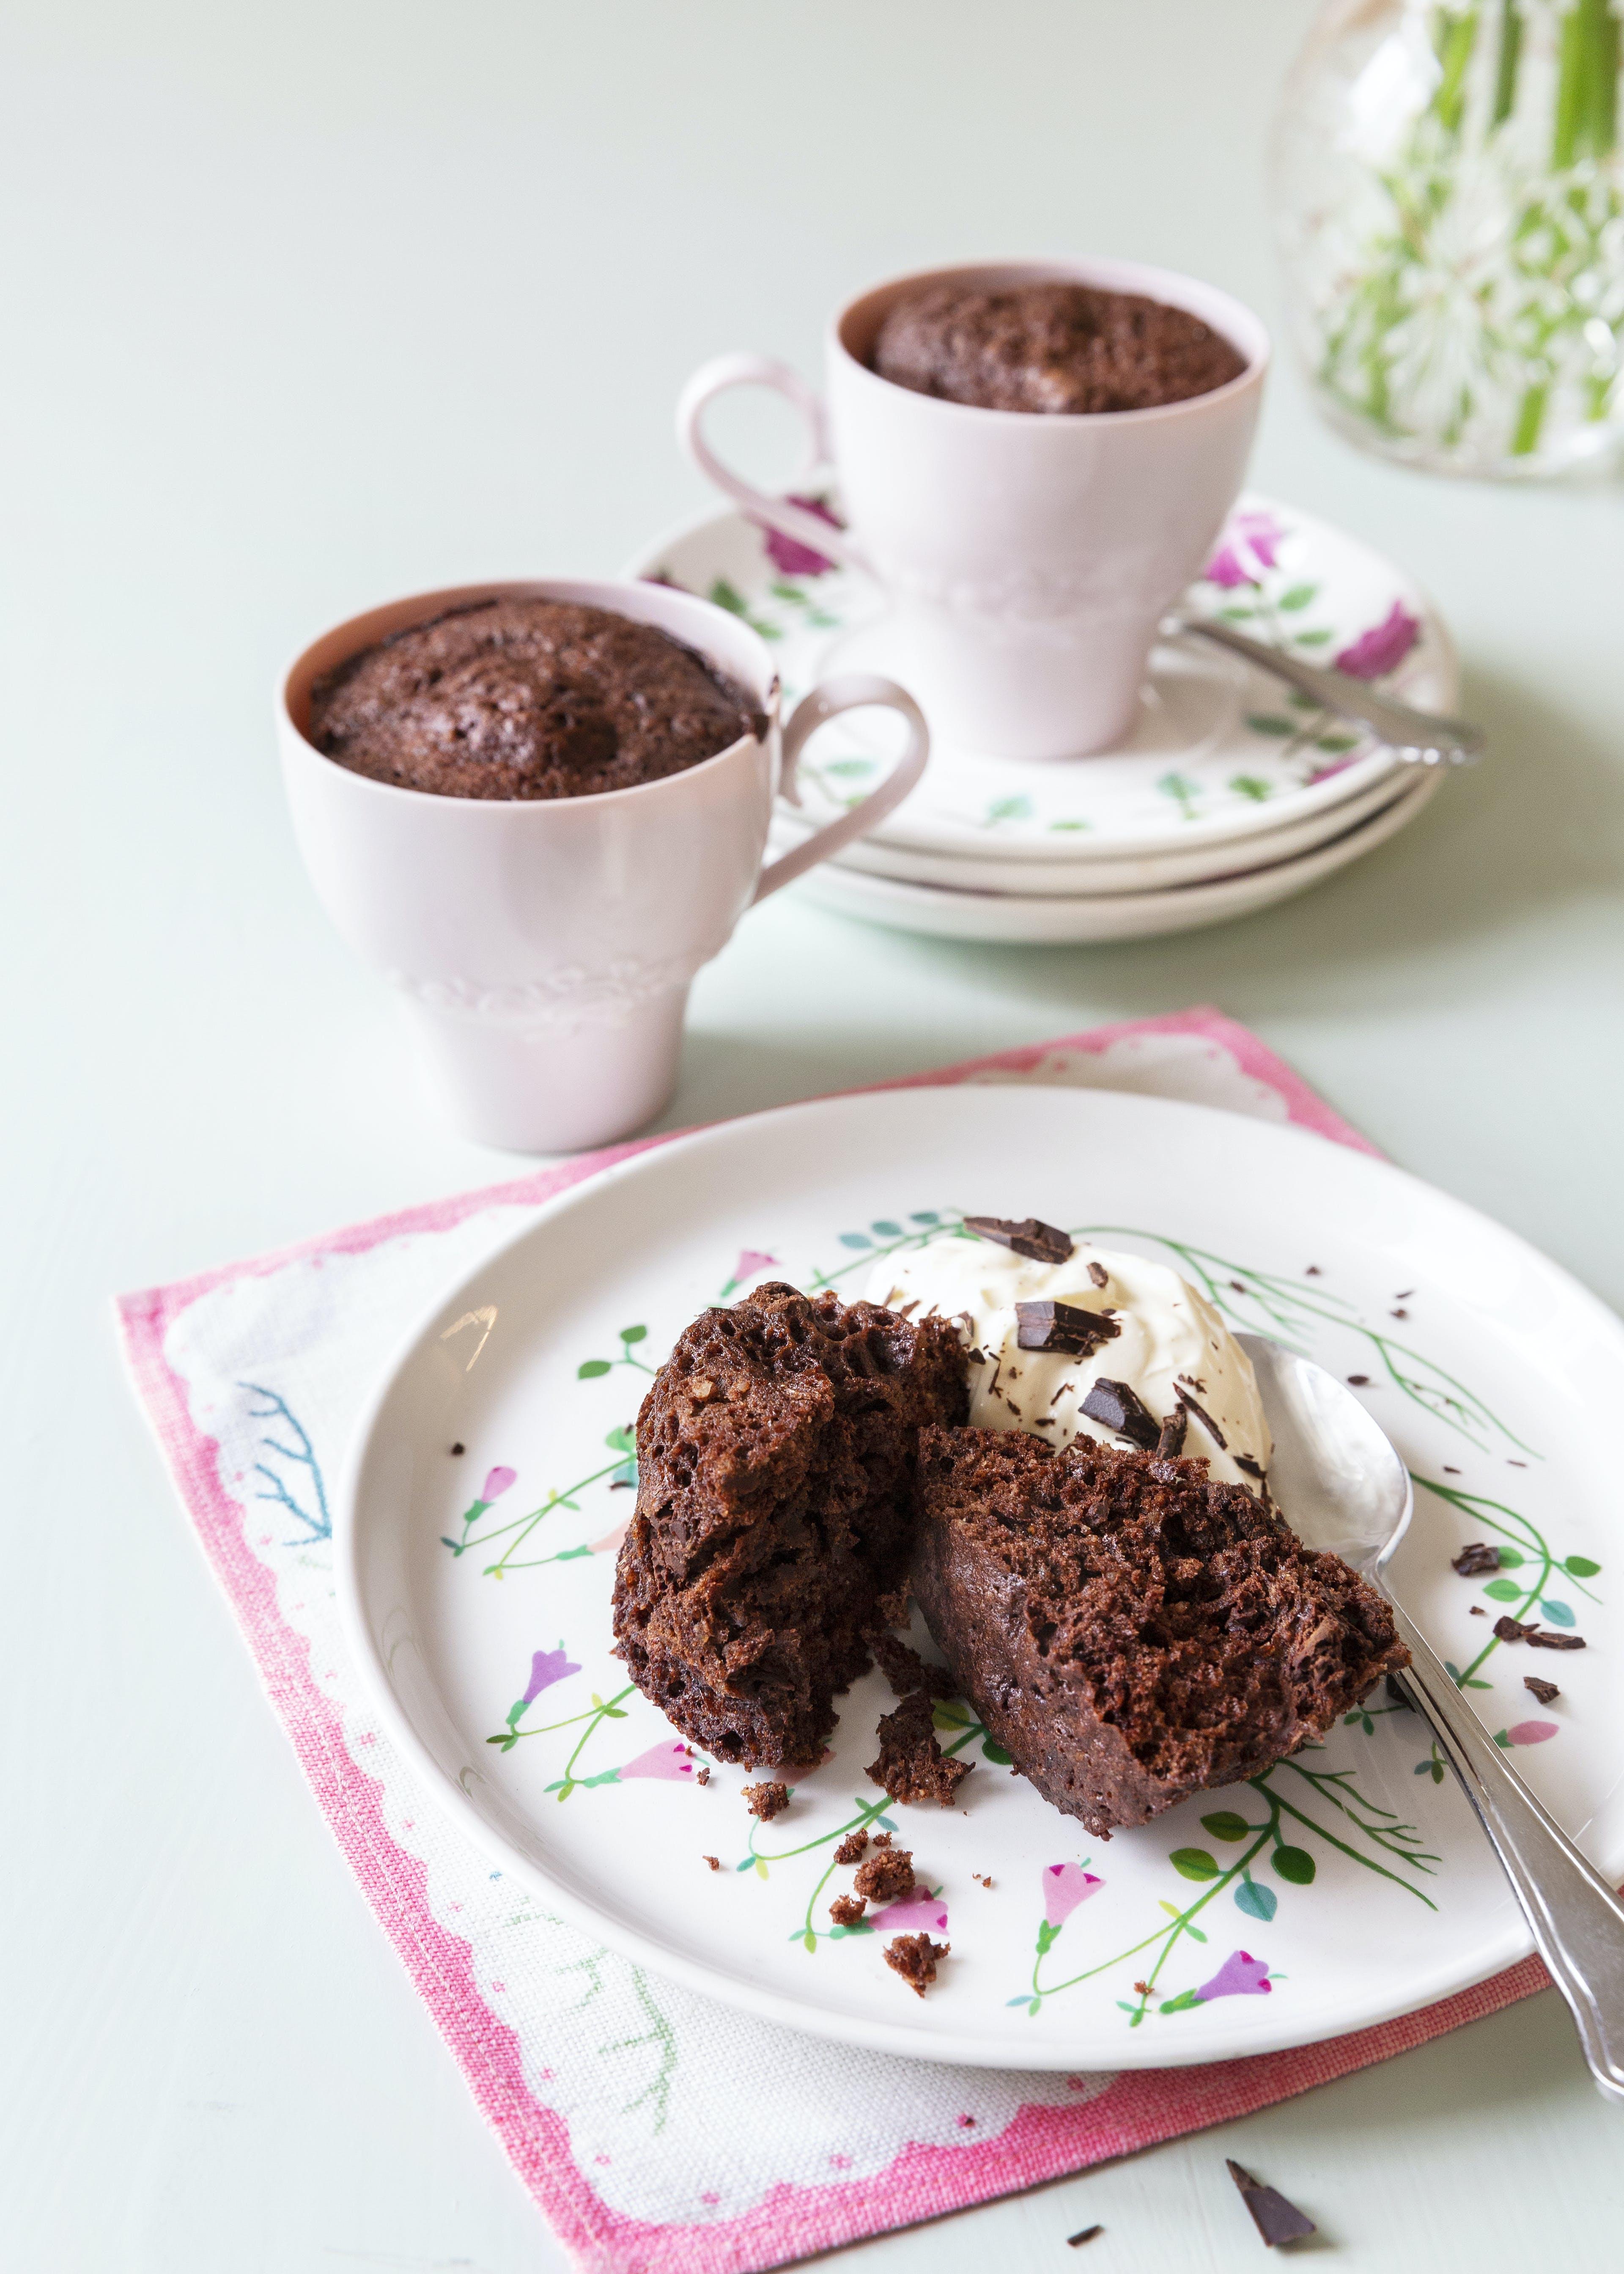 Muffin keto de chocolate en una taza